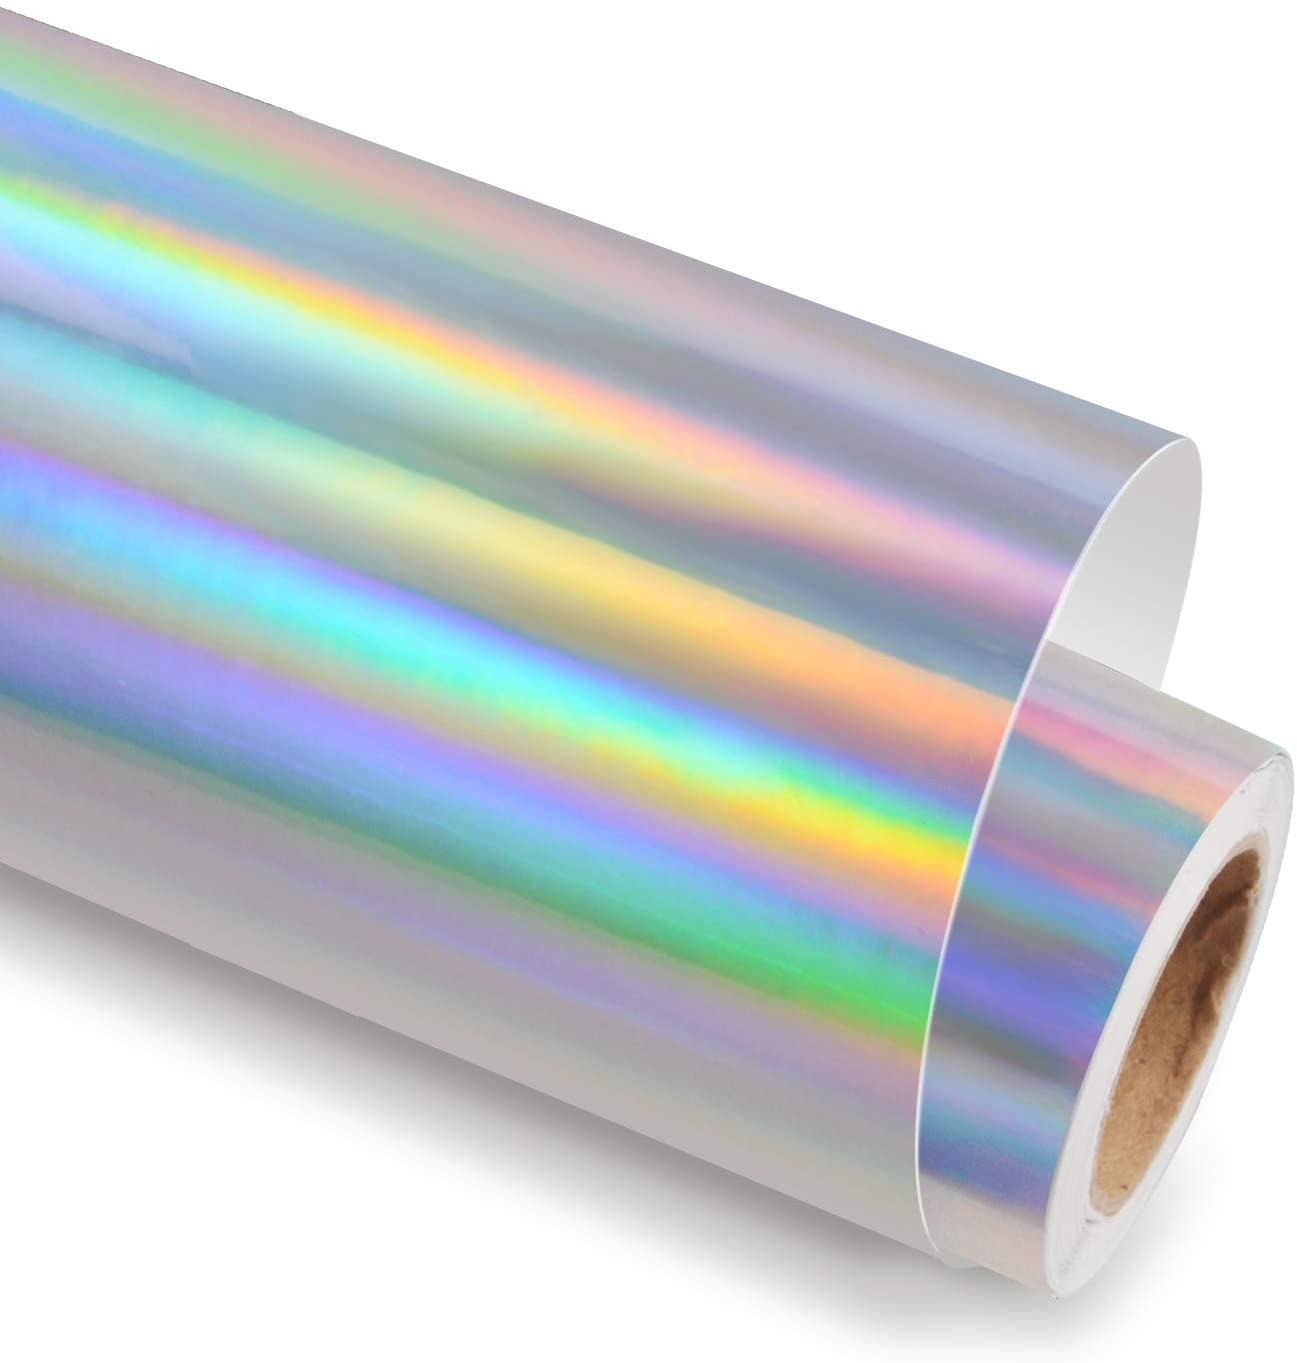 Vinil Adesivo Silhouette Plotter - Kit Escolha a Cor - 30 CM